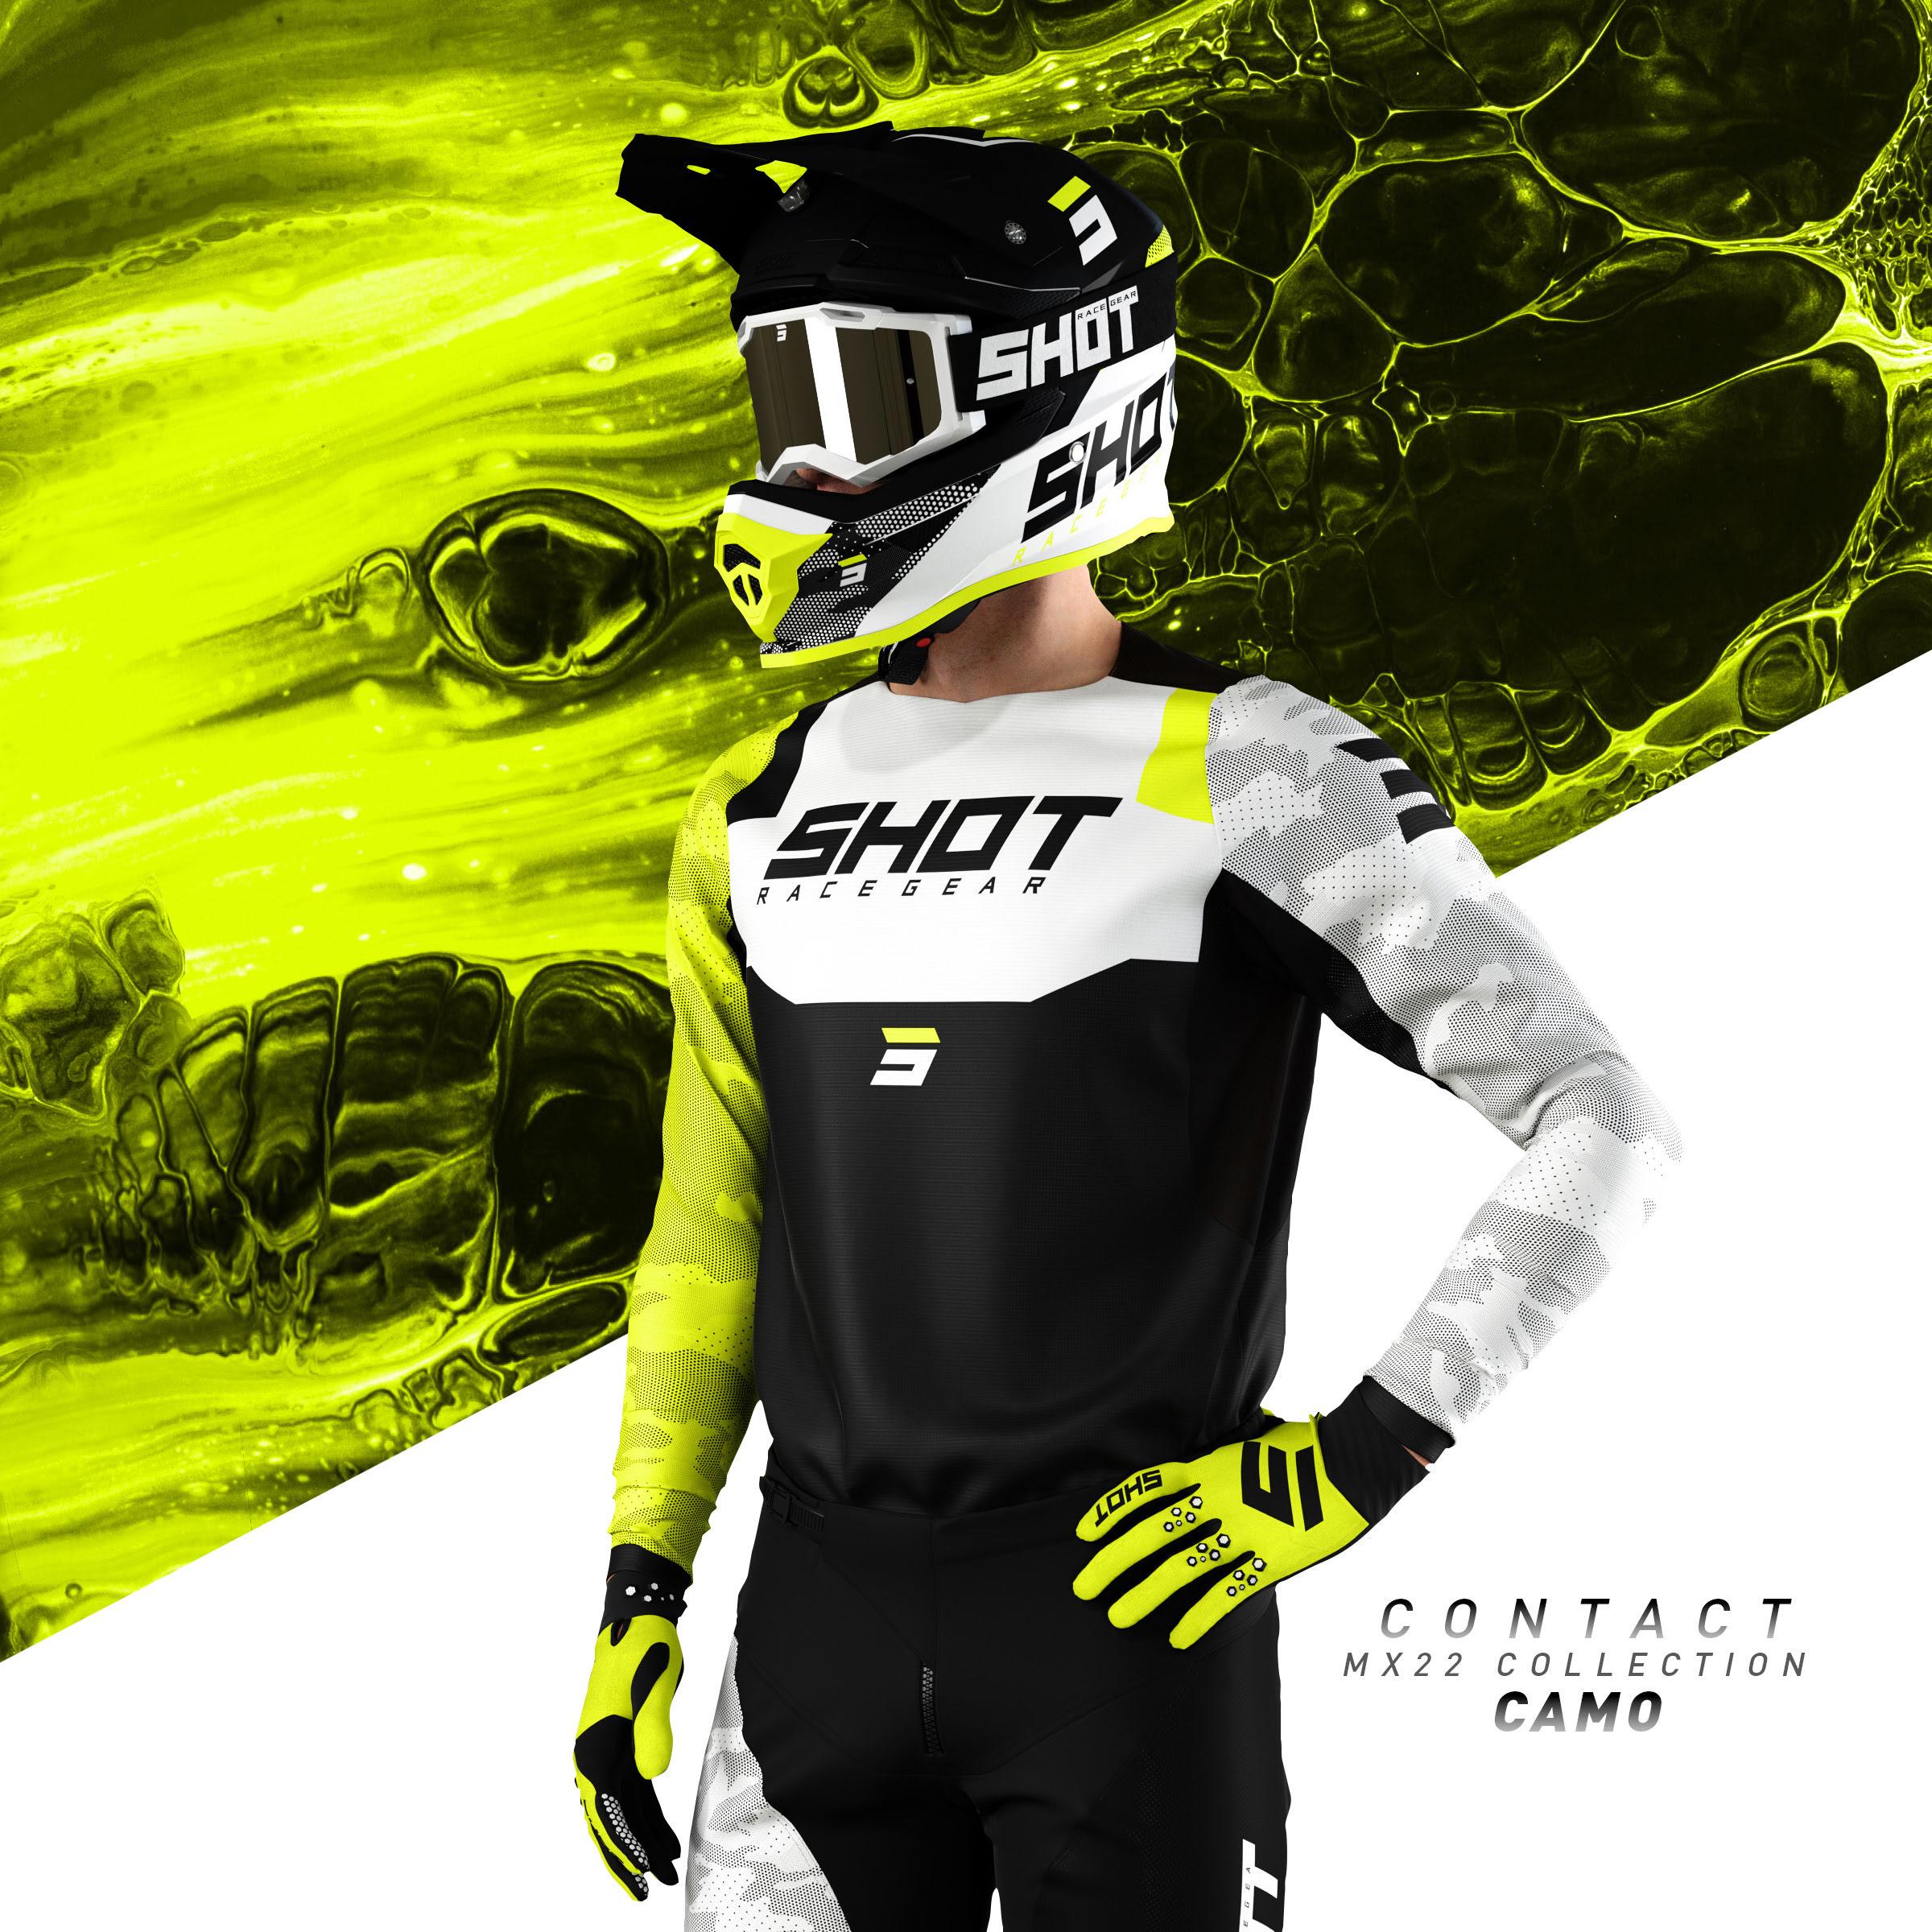 SHOT 2022 - Contact Camo